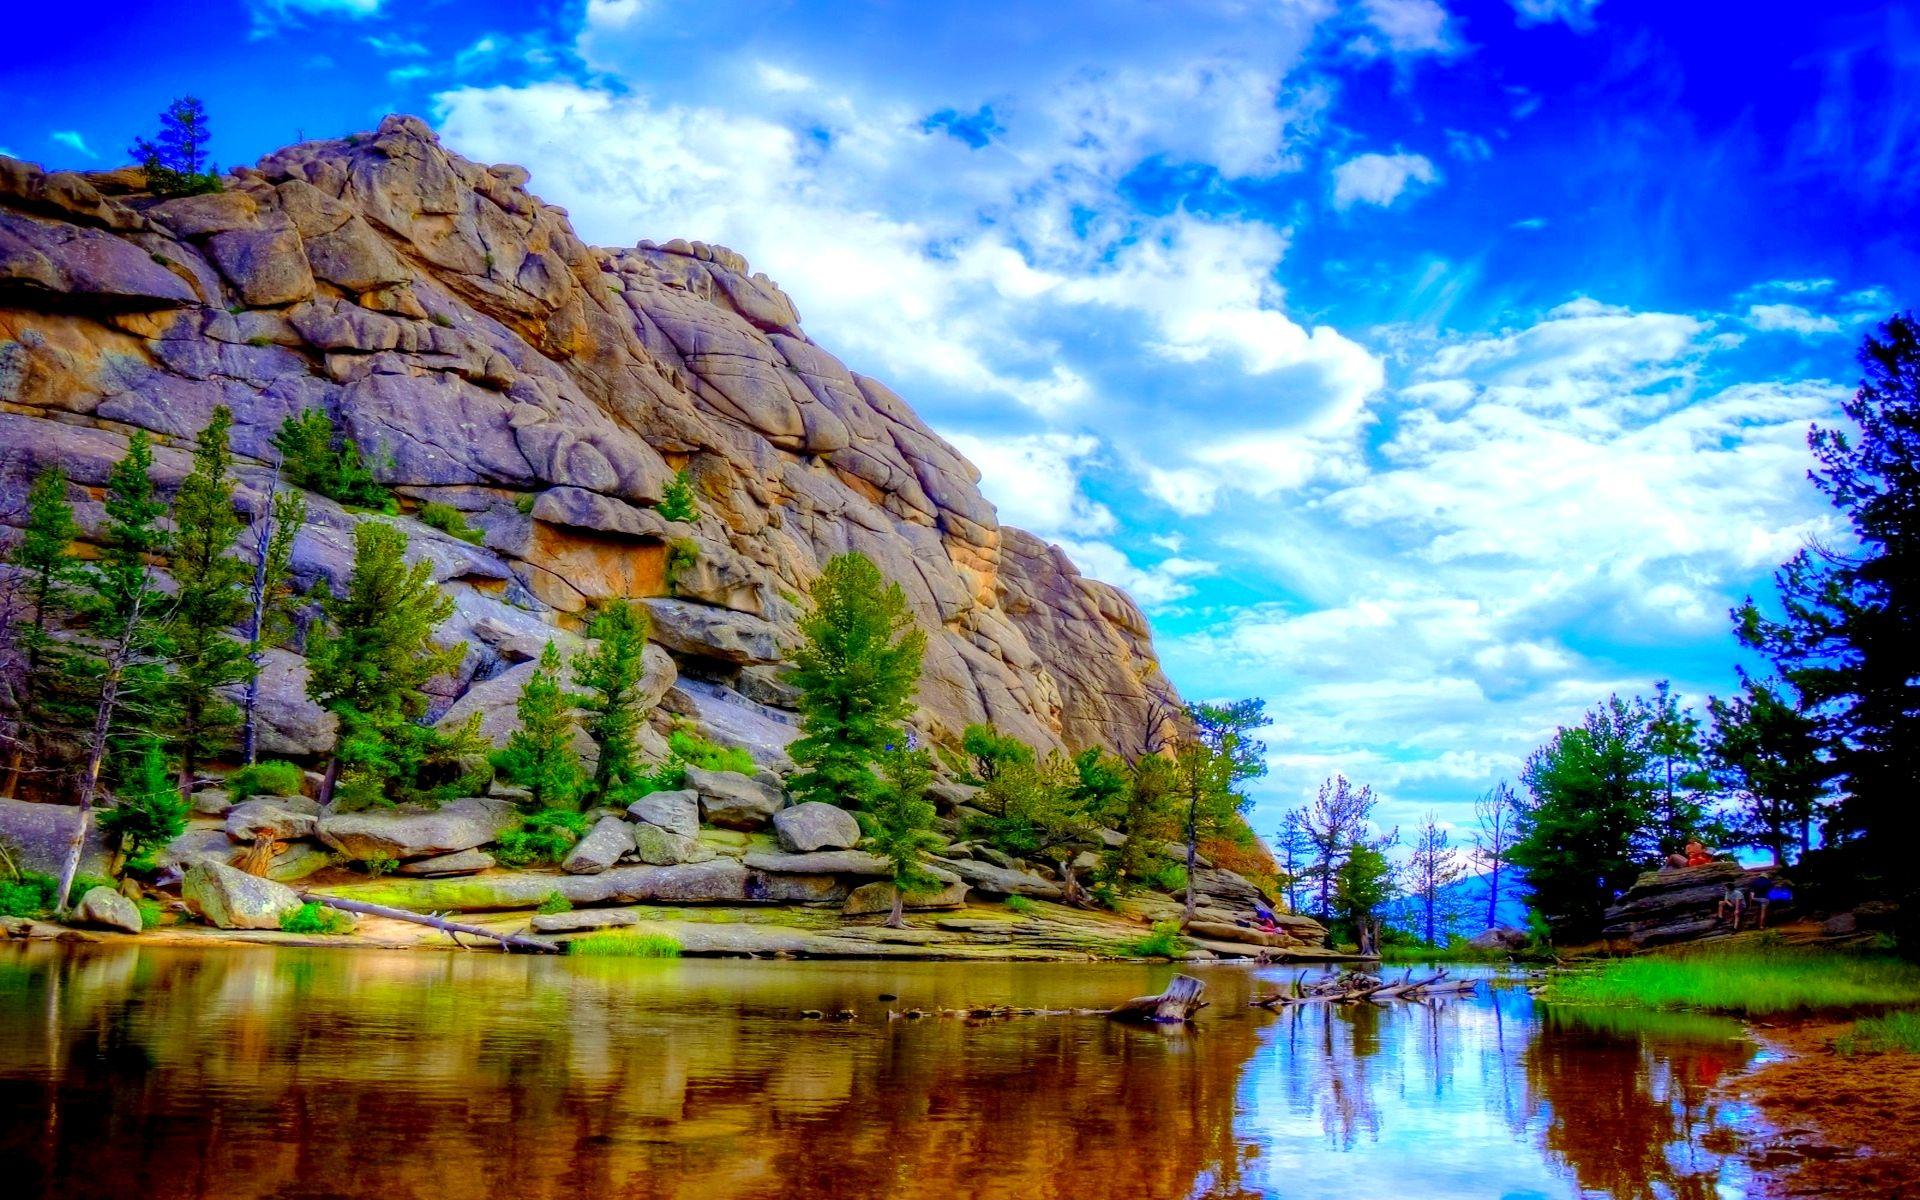 Rocky Mountain River Beautiful Mountains Scenery Rocky Mountain National Park